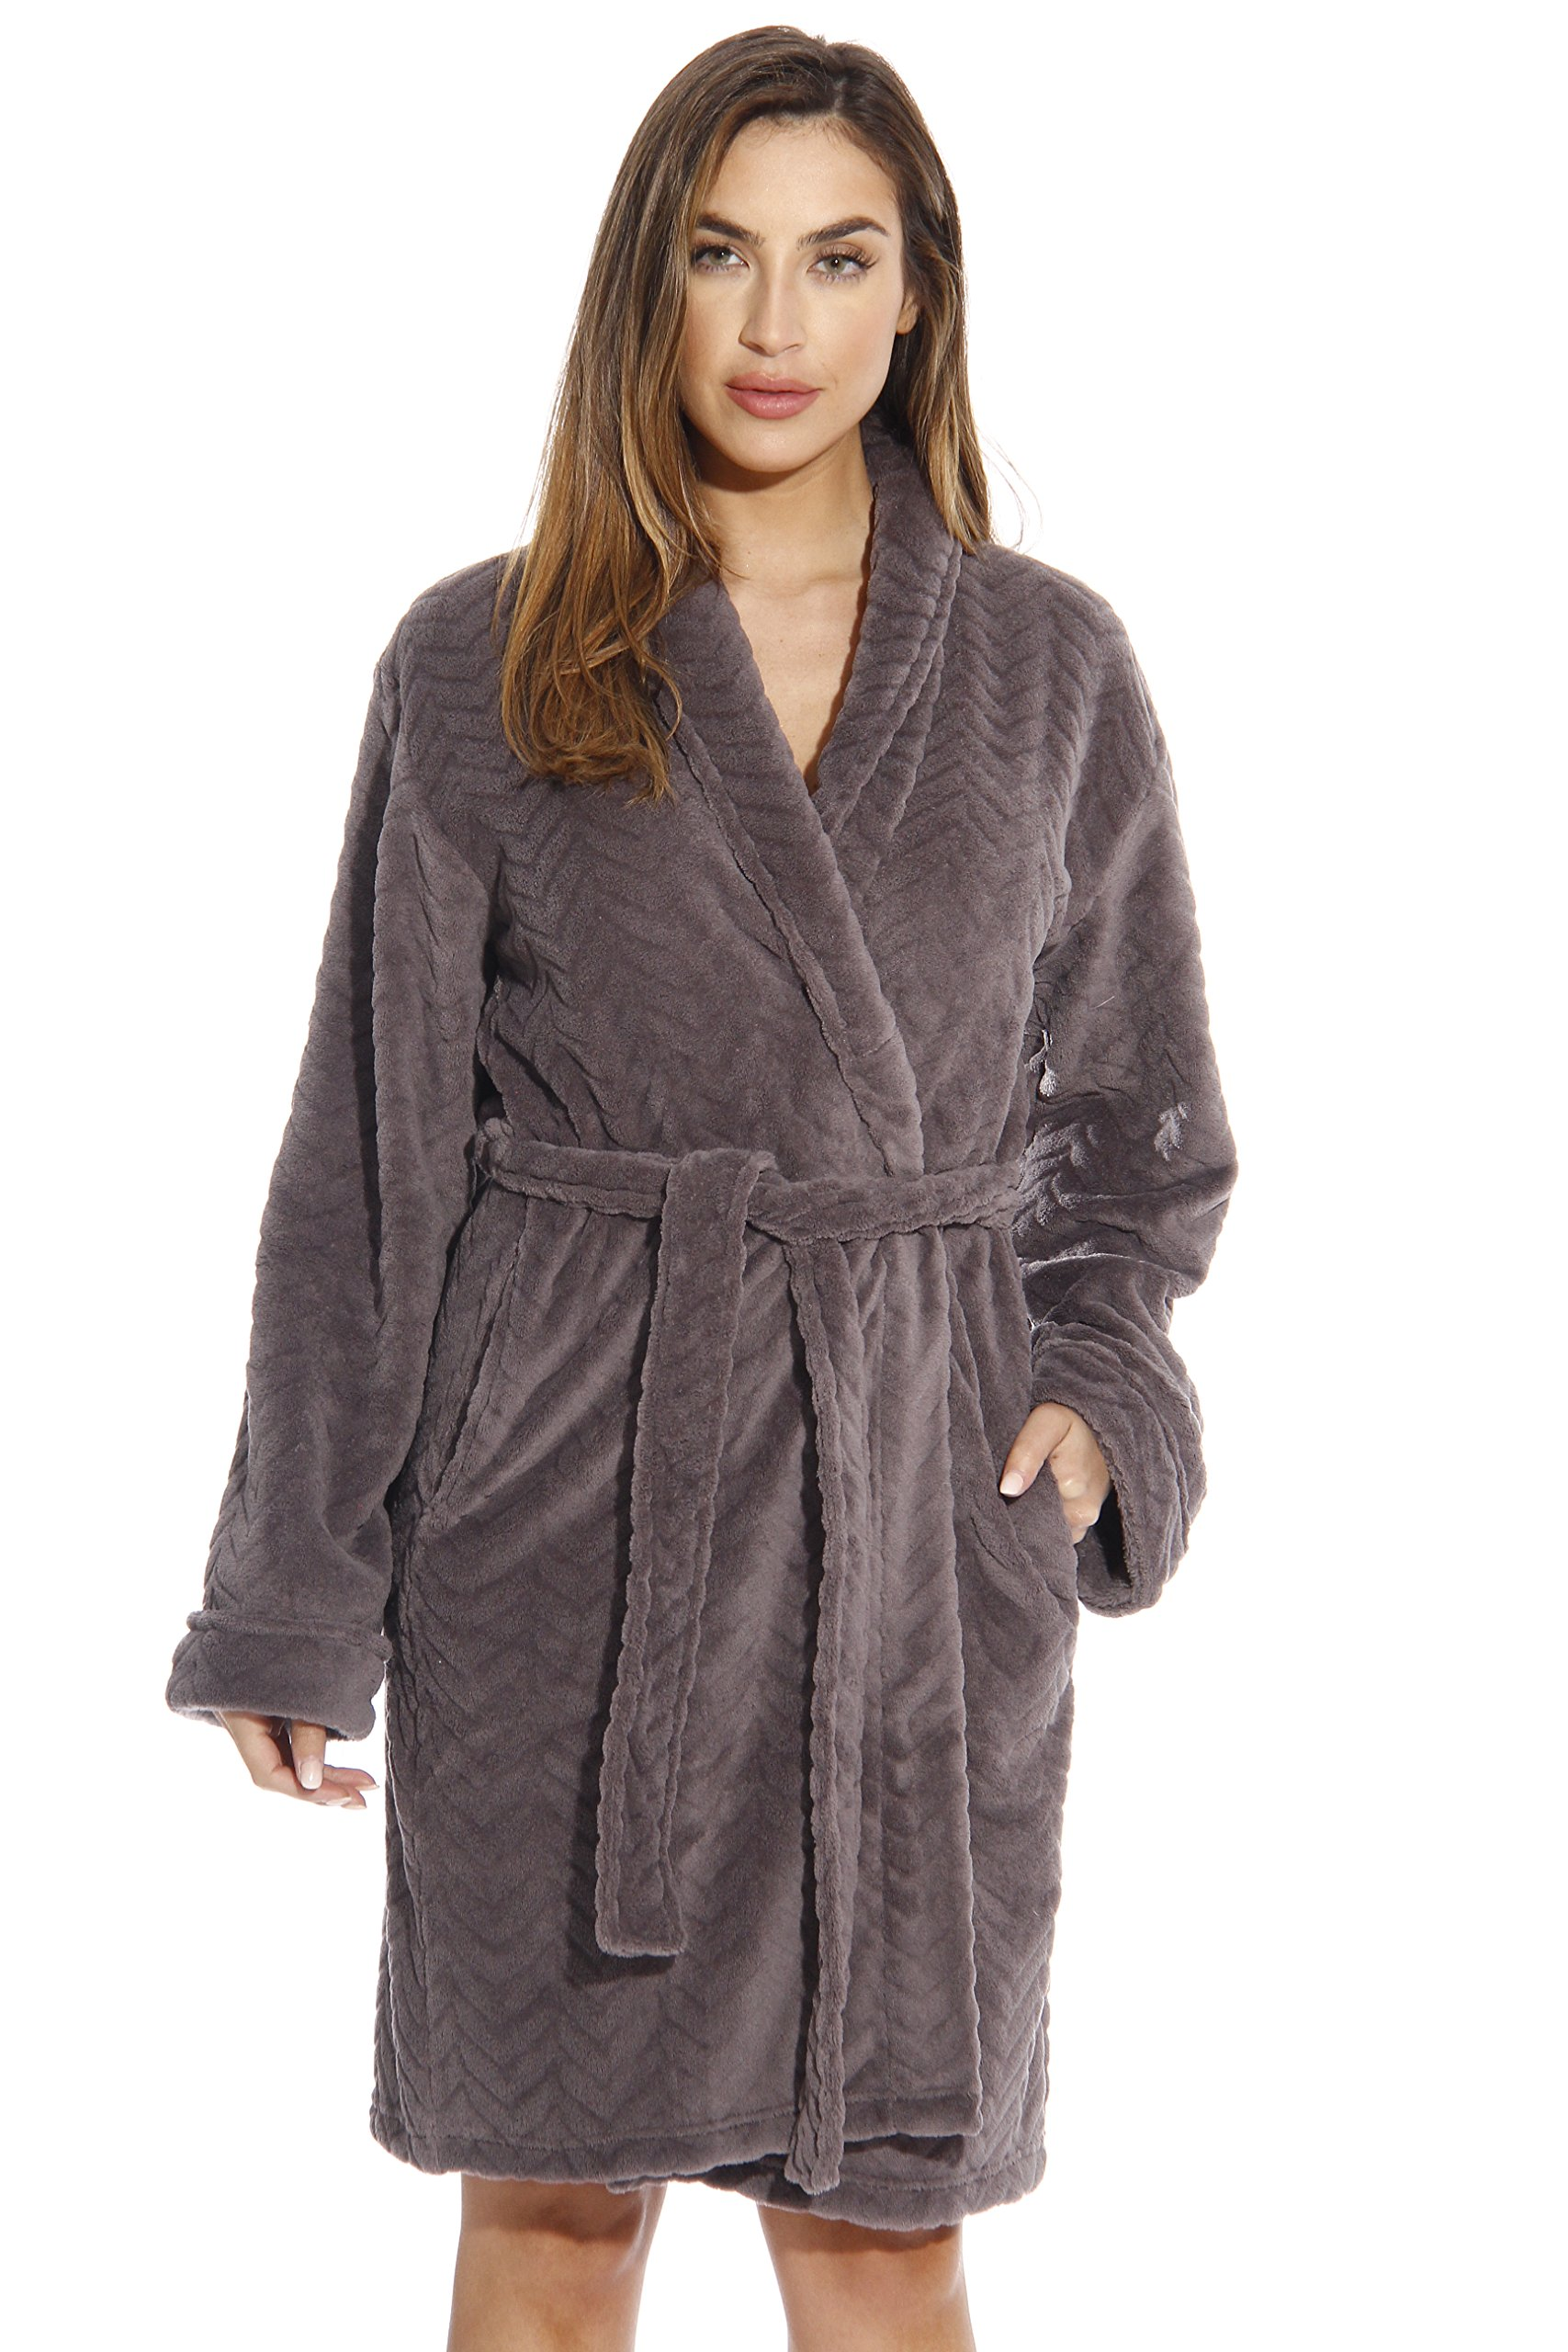 6312-Charcoal-M Just Love Kimono Robe / Bath Robes for Women